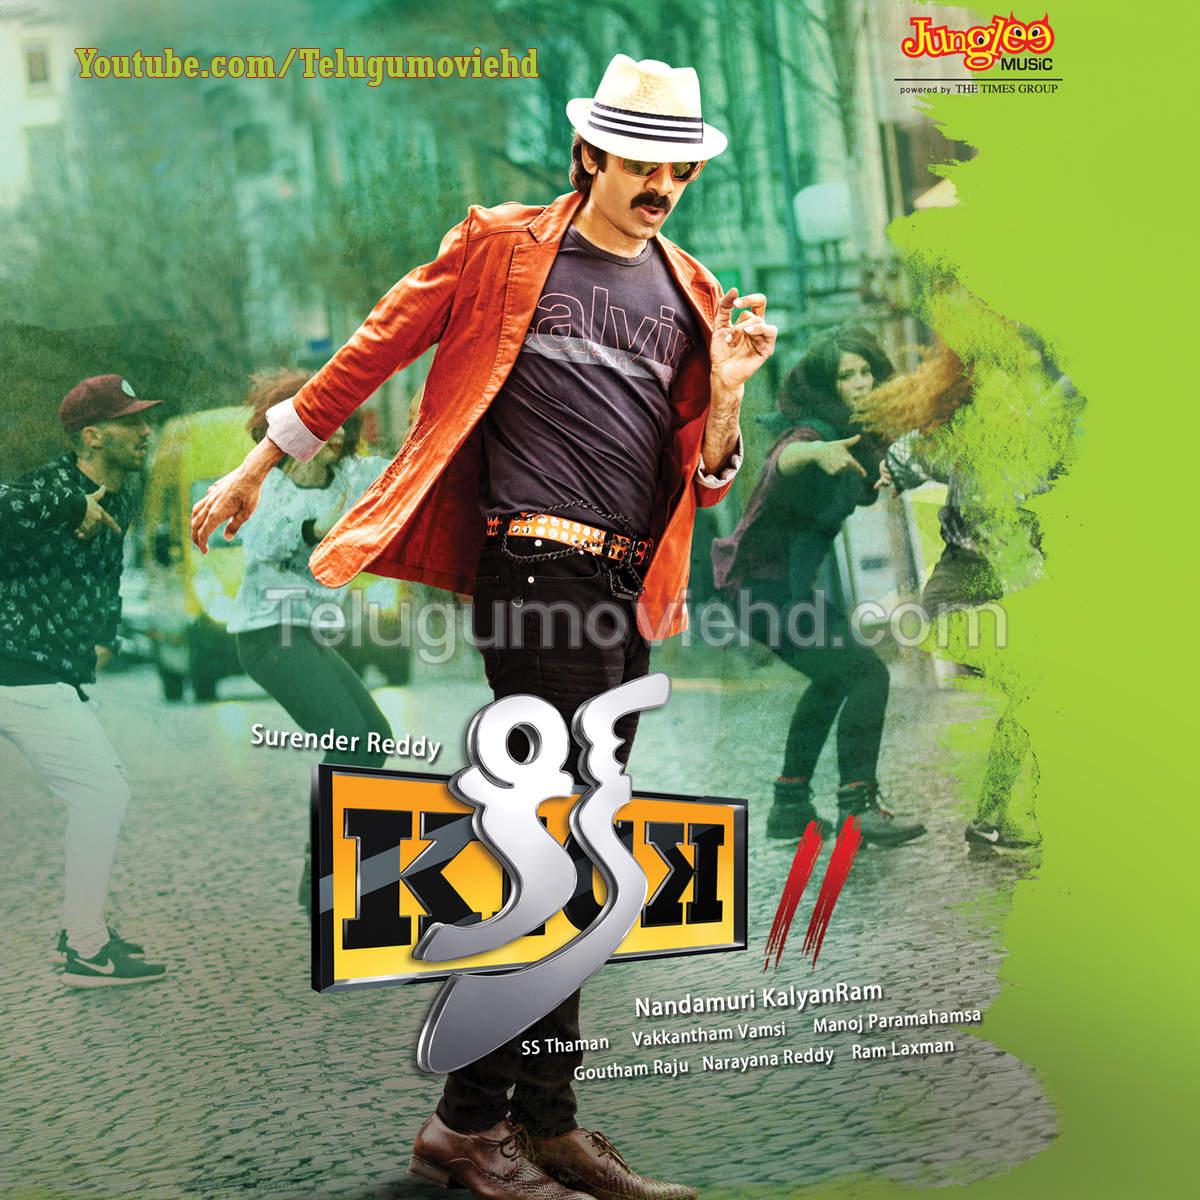 Kick 2 movie hindi dubbed download : Watch season 5 episode